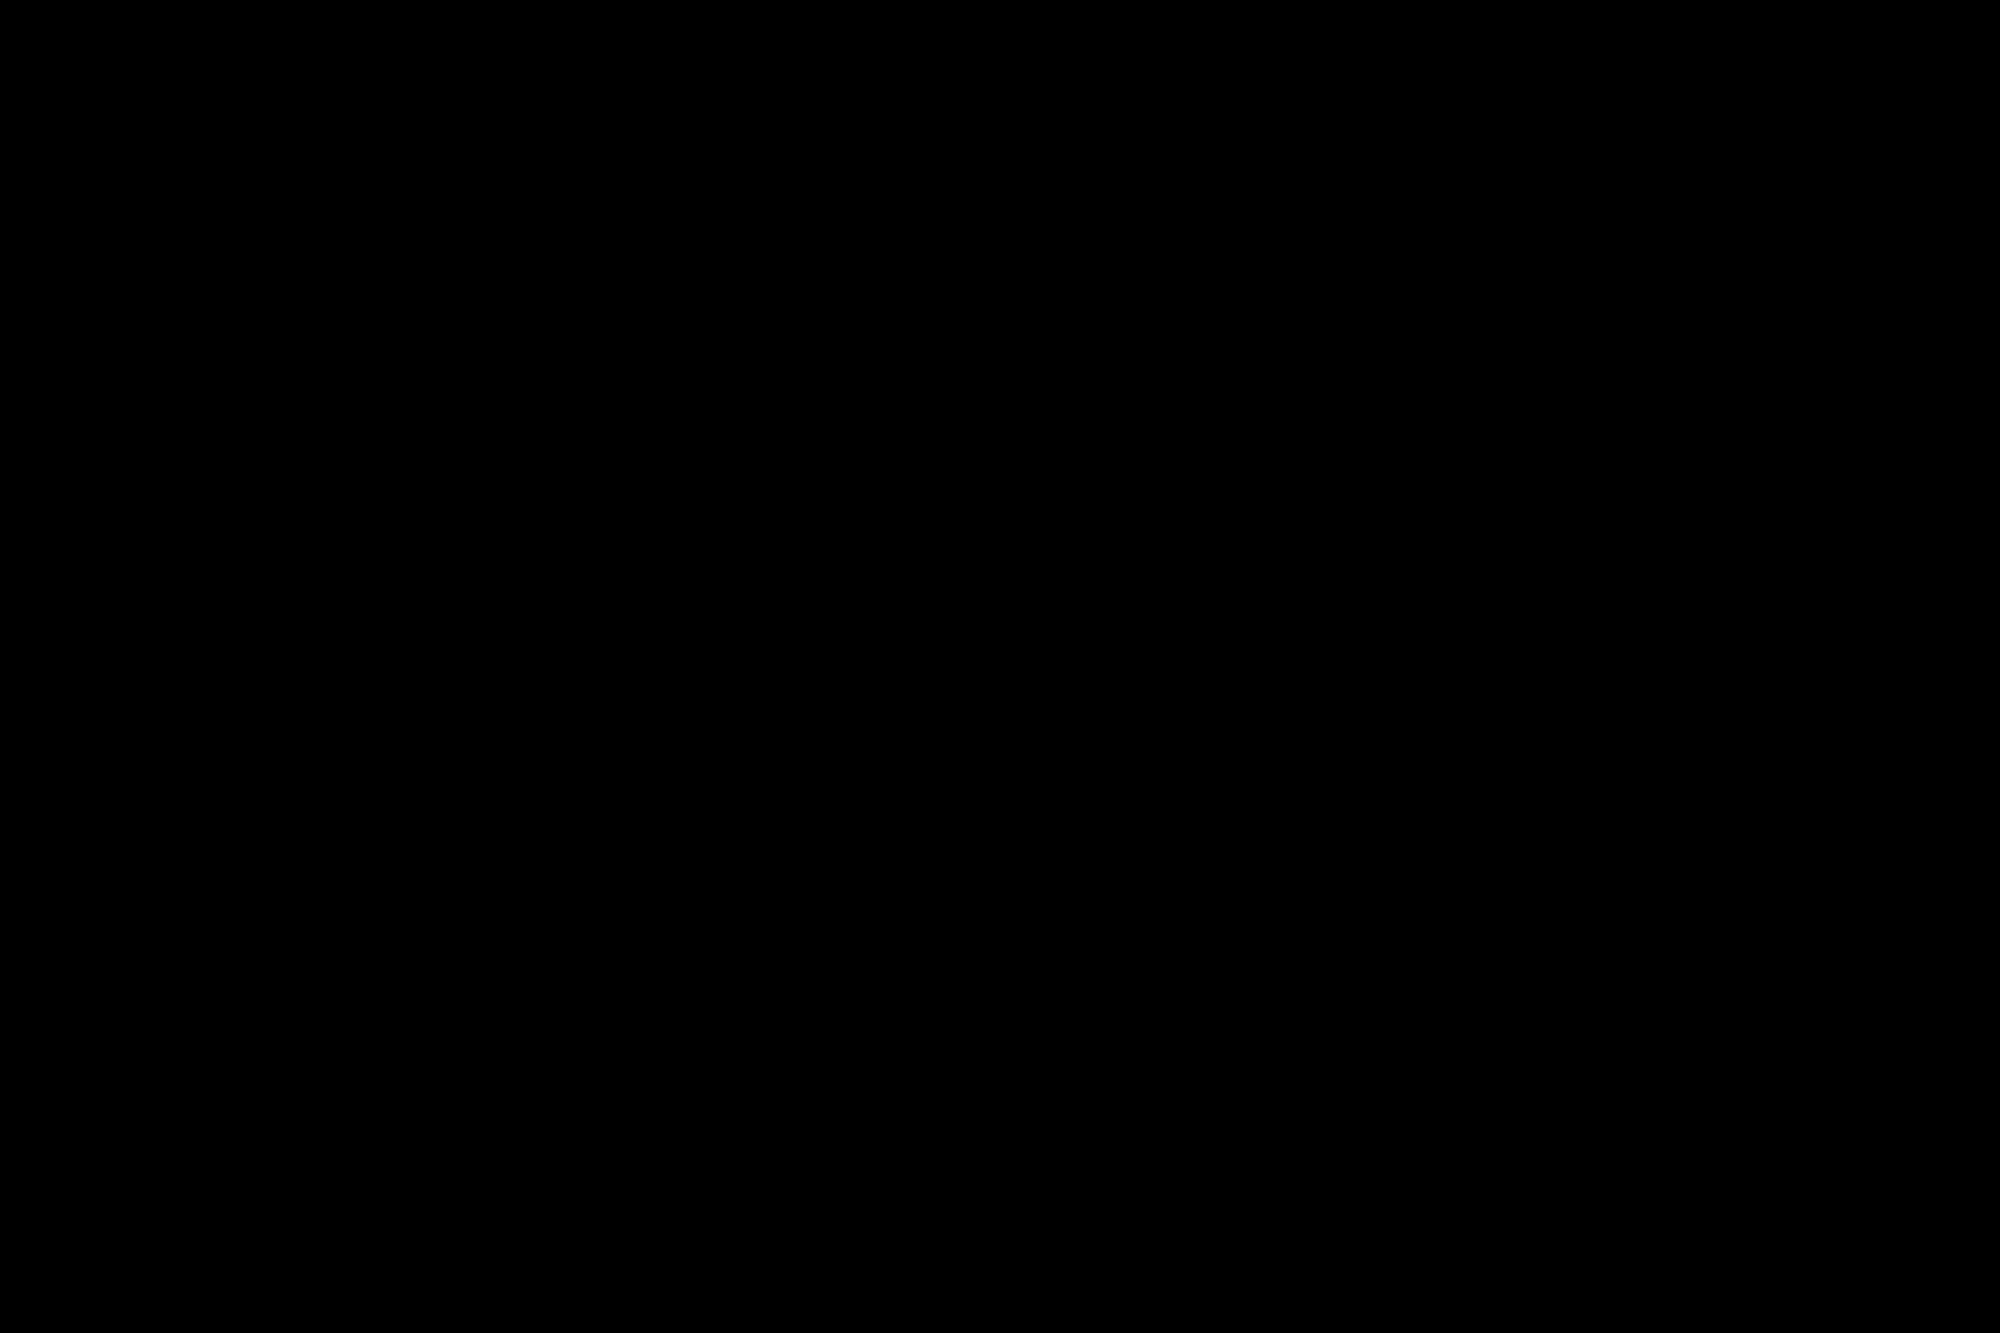 hydralteatime